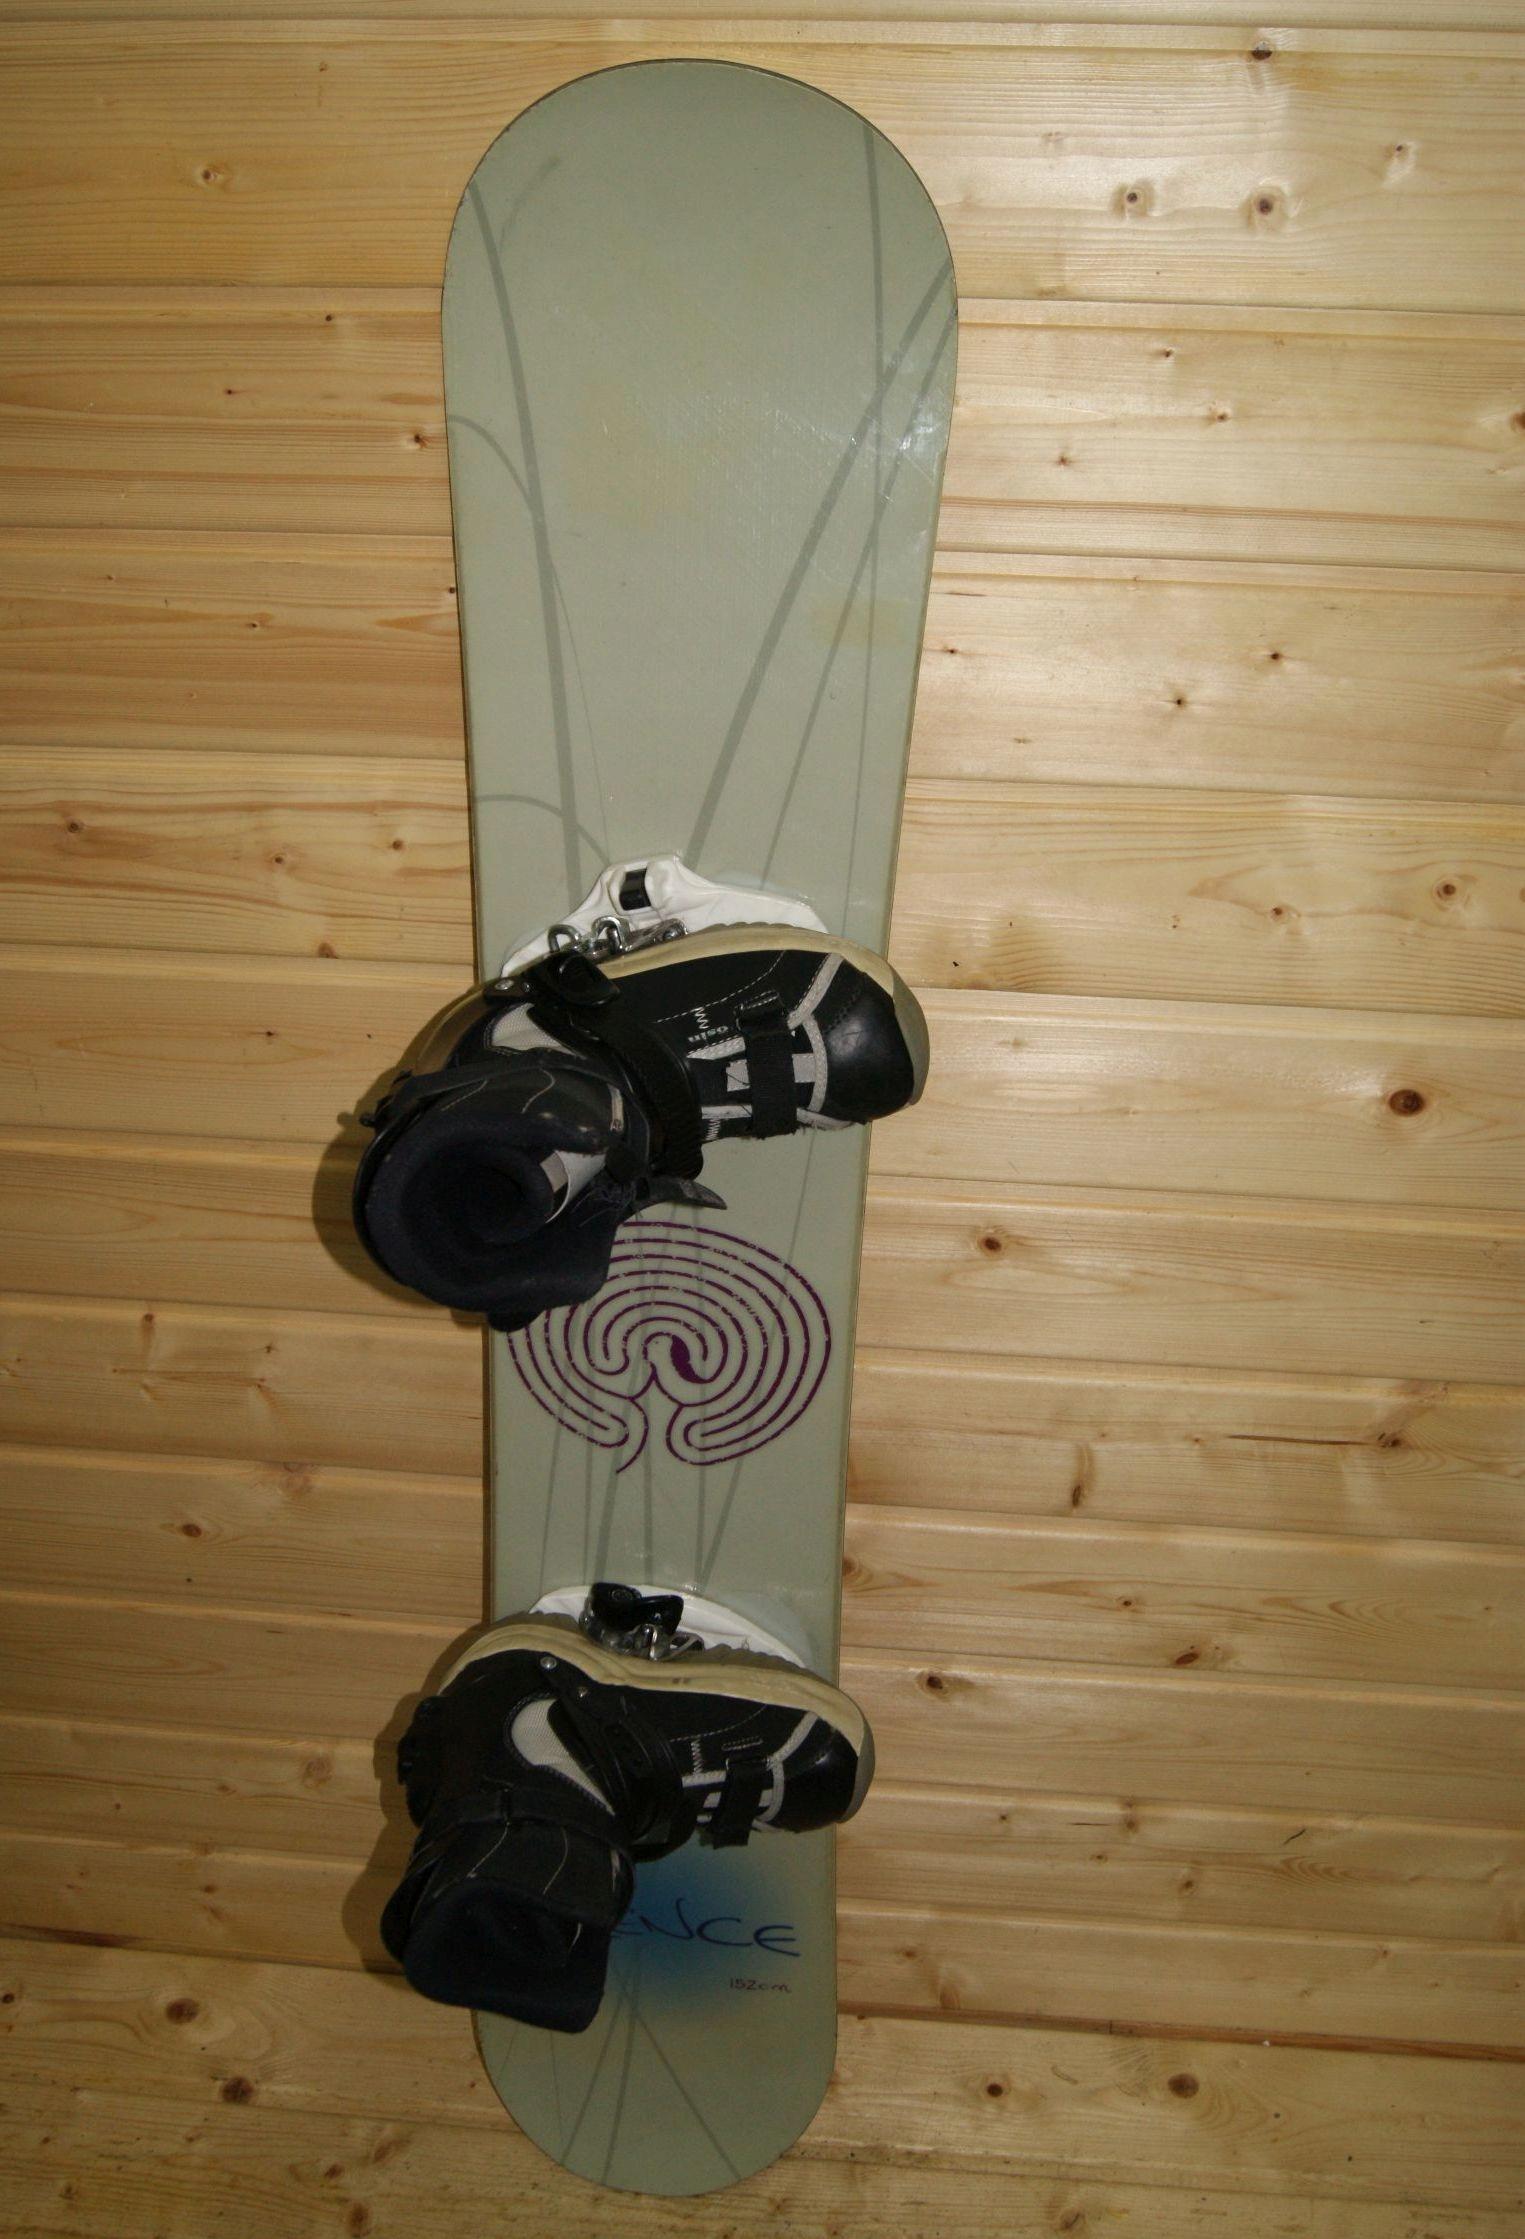 Zestaw deska snowboardowa Silence 152 + buty Osin